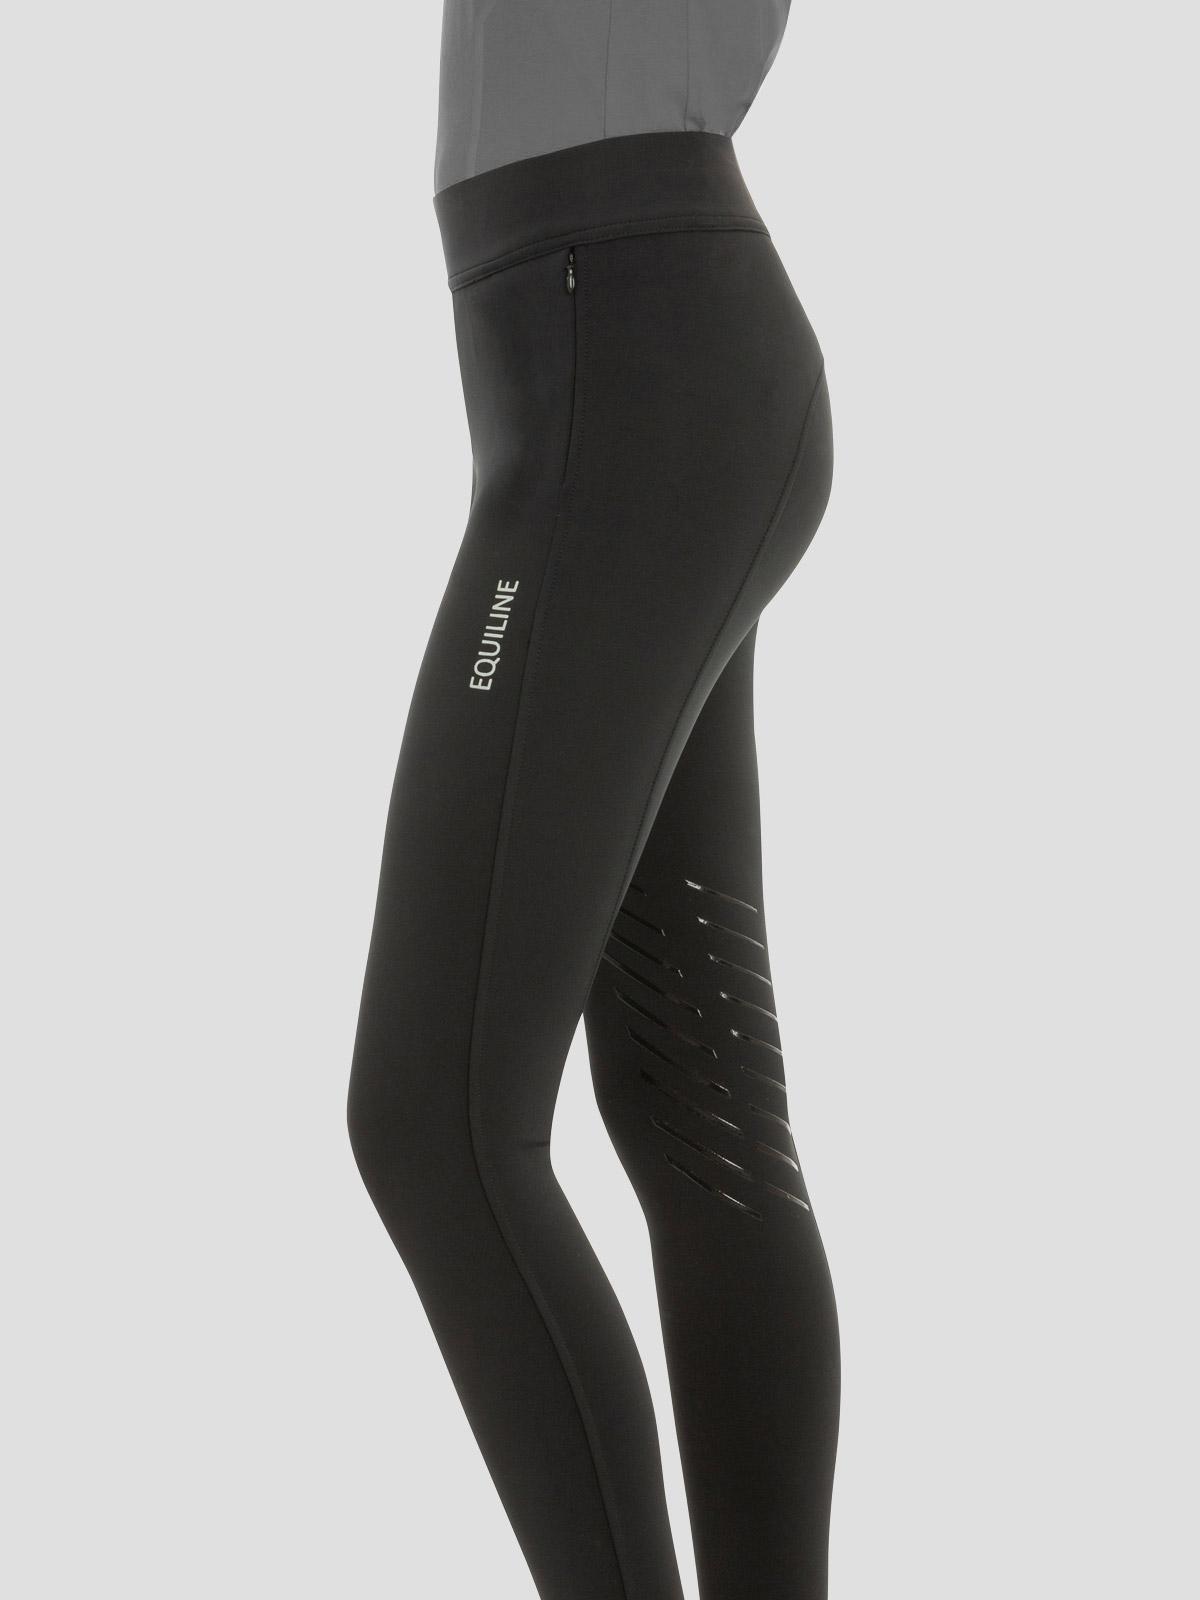 CHARLAC WOMEN'S LEGGINGS PANTS 1